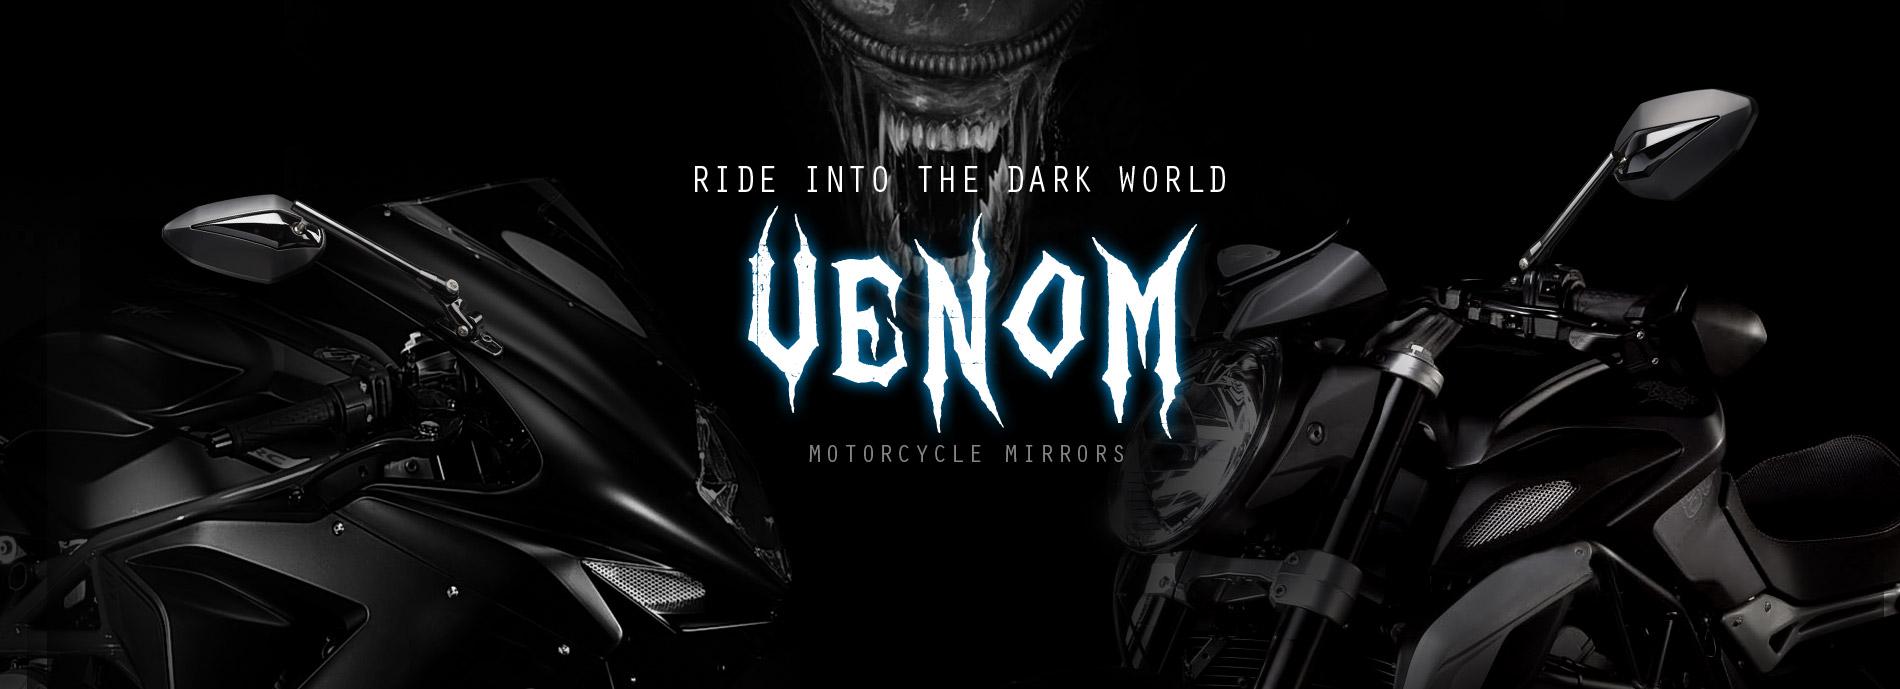 slide-ad-Venom